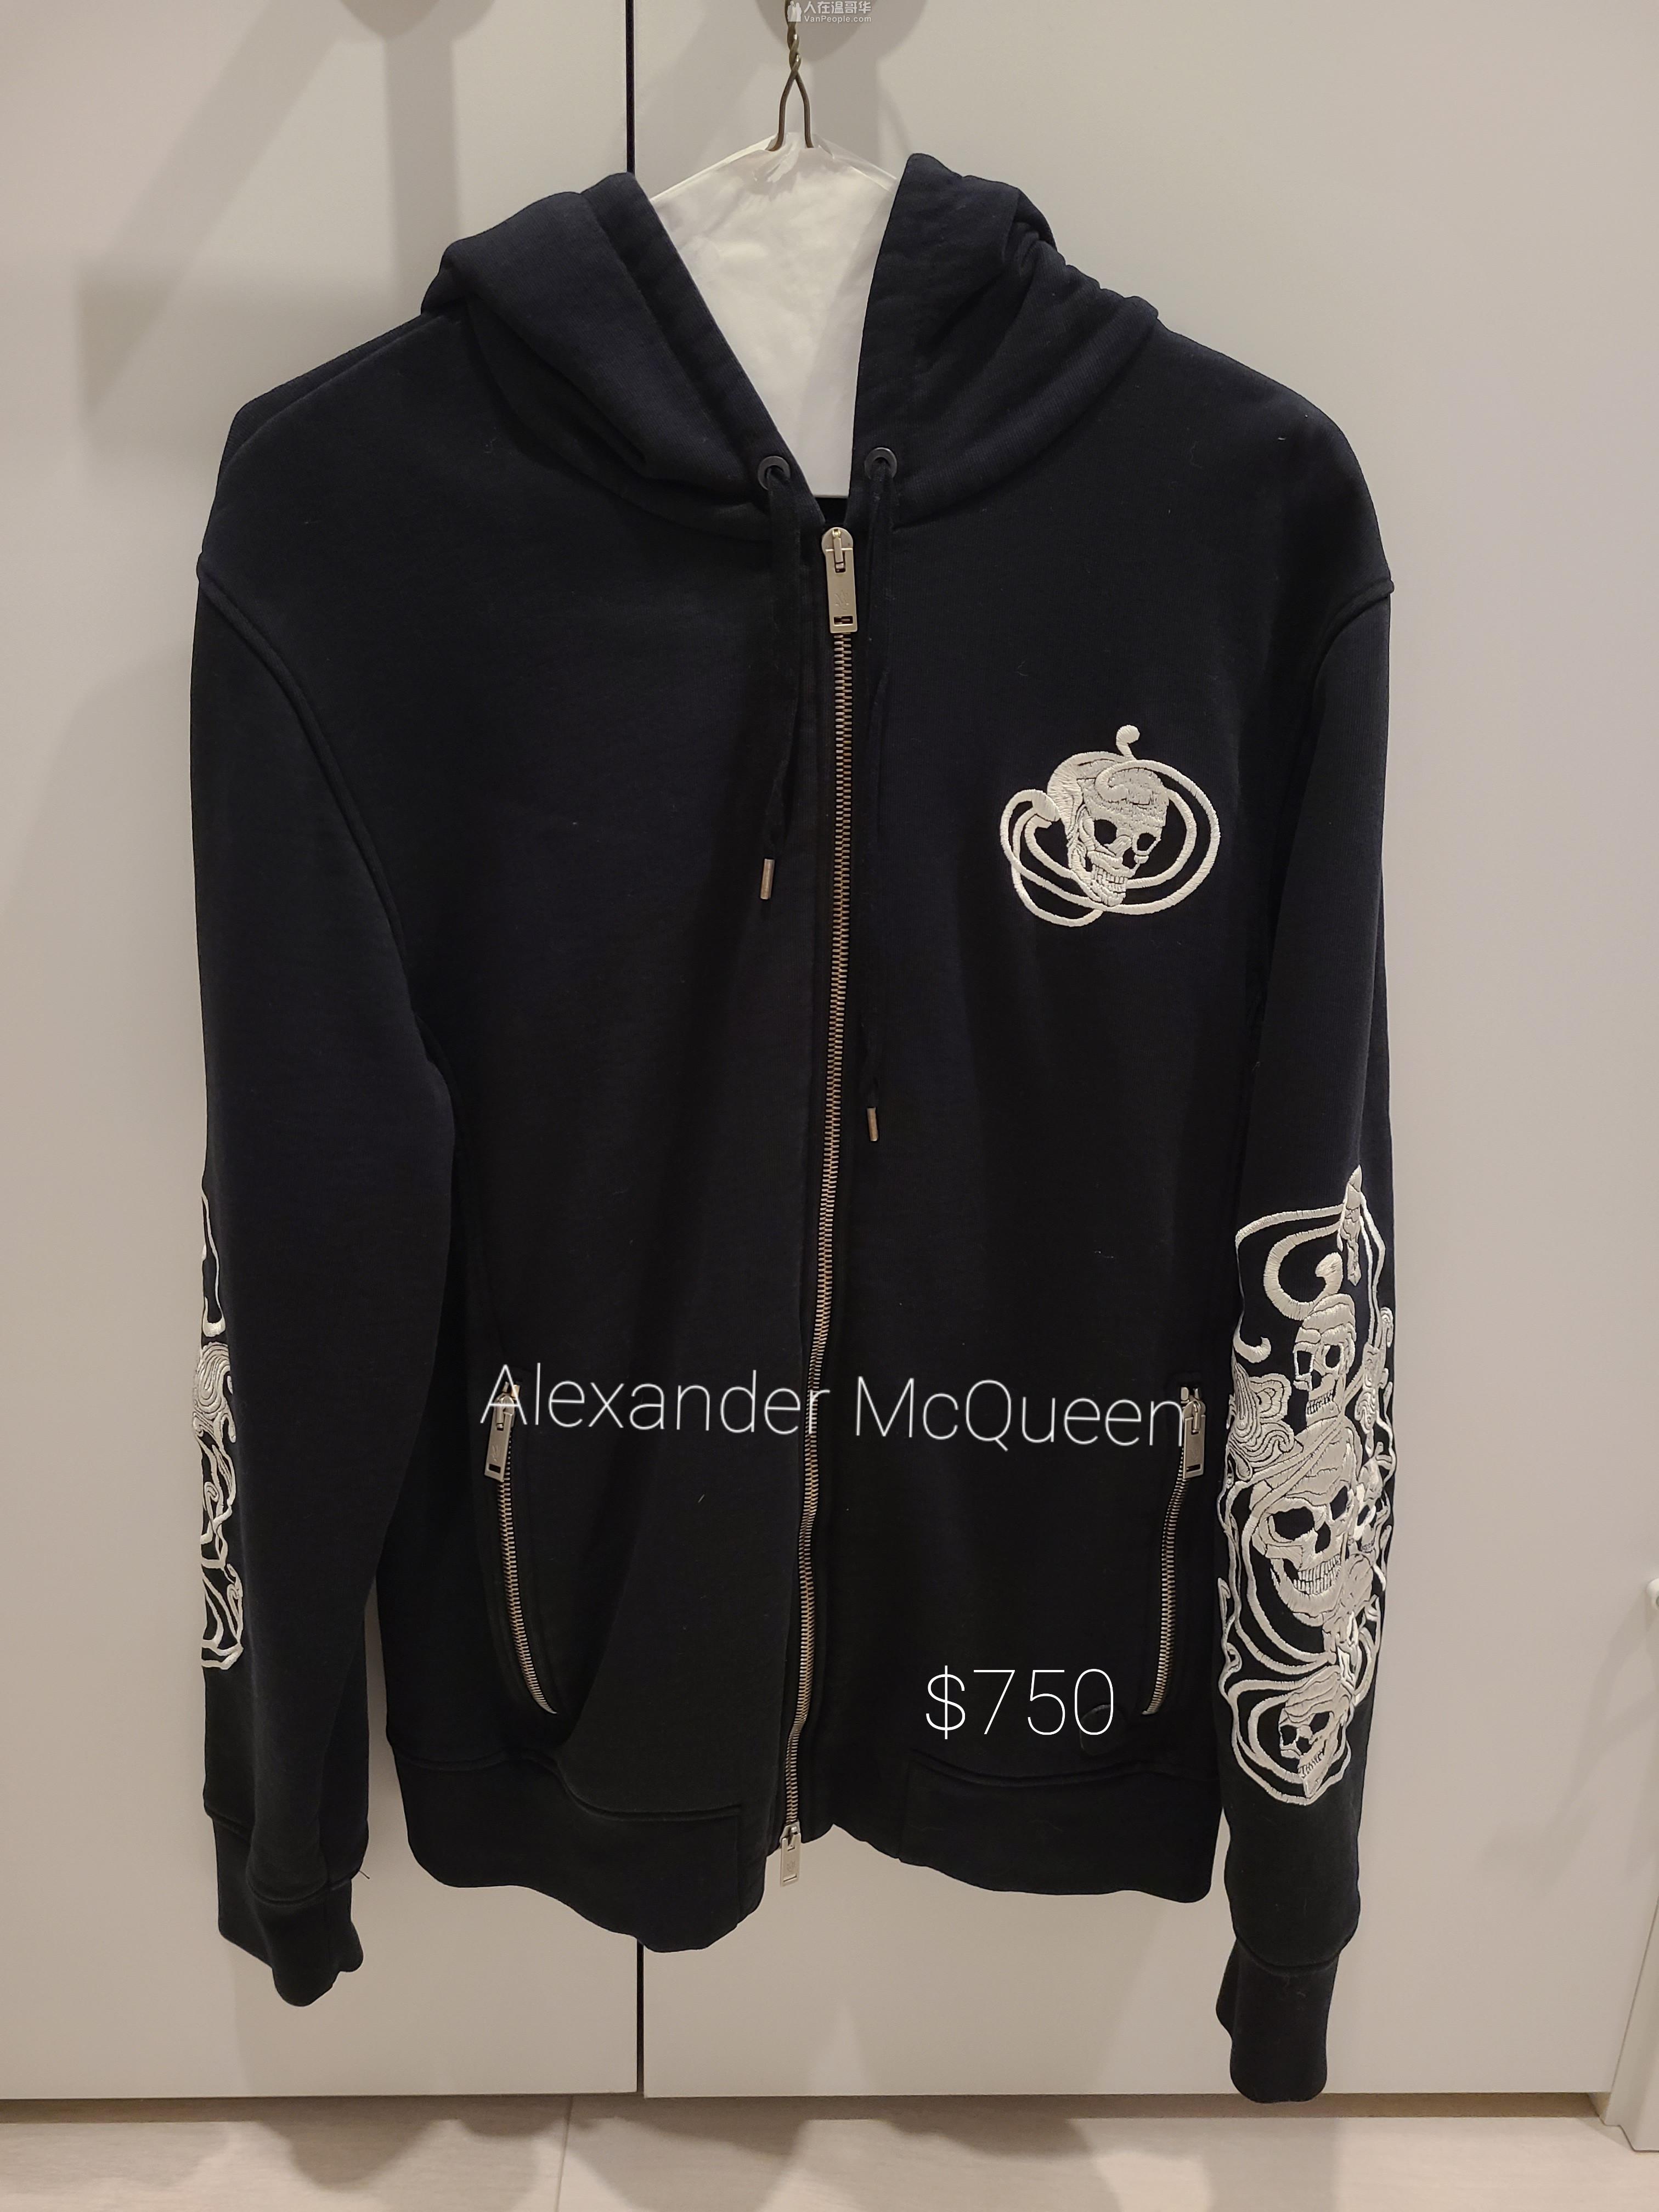 二手名牌衣服 VERSACE/OFF-WHITE/GIVENCHY/ALEXANDER MCQUEEN